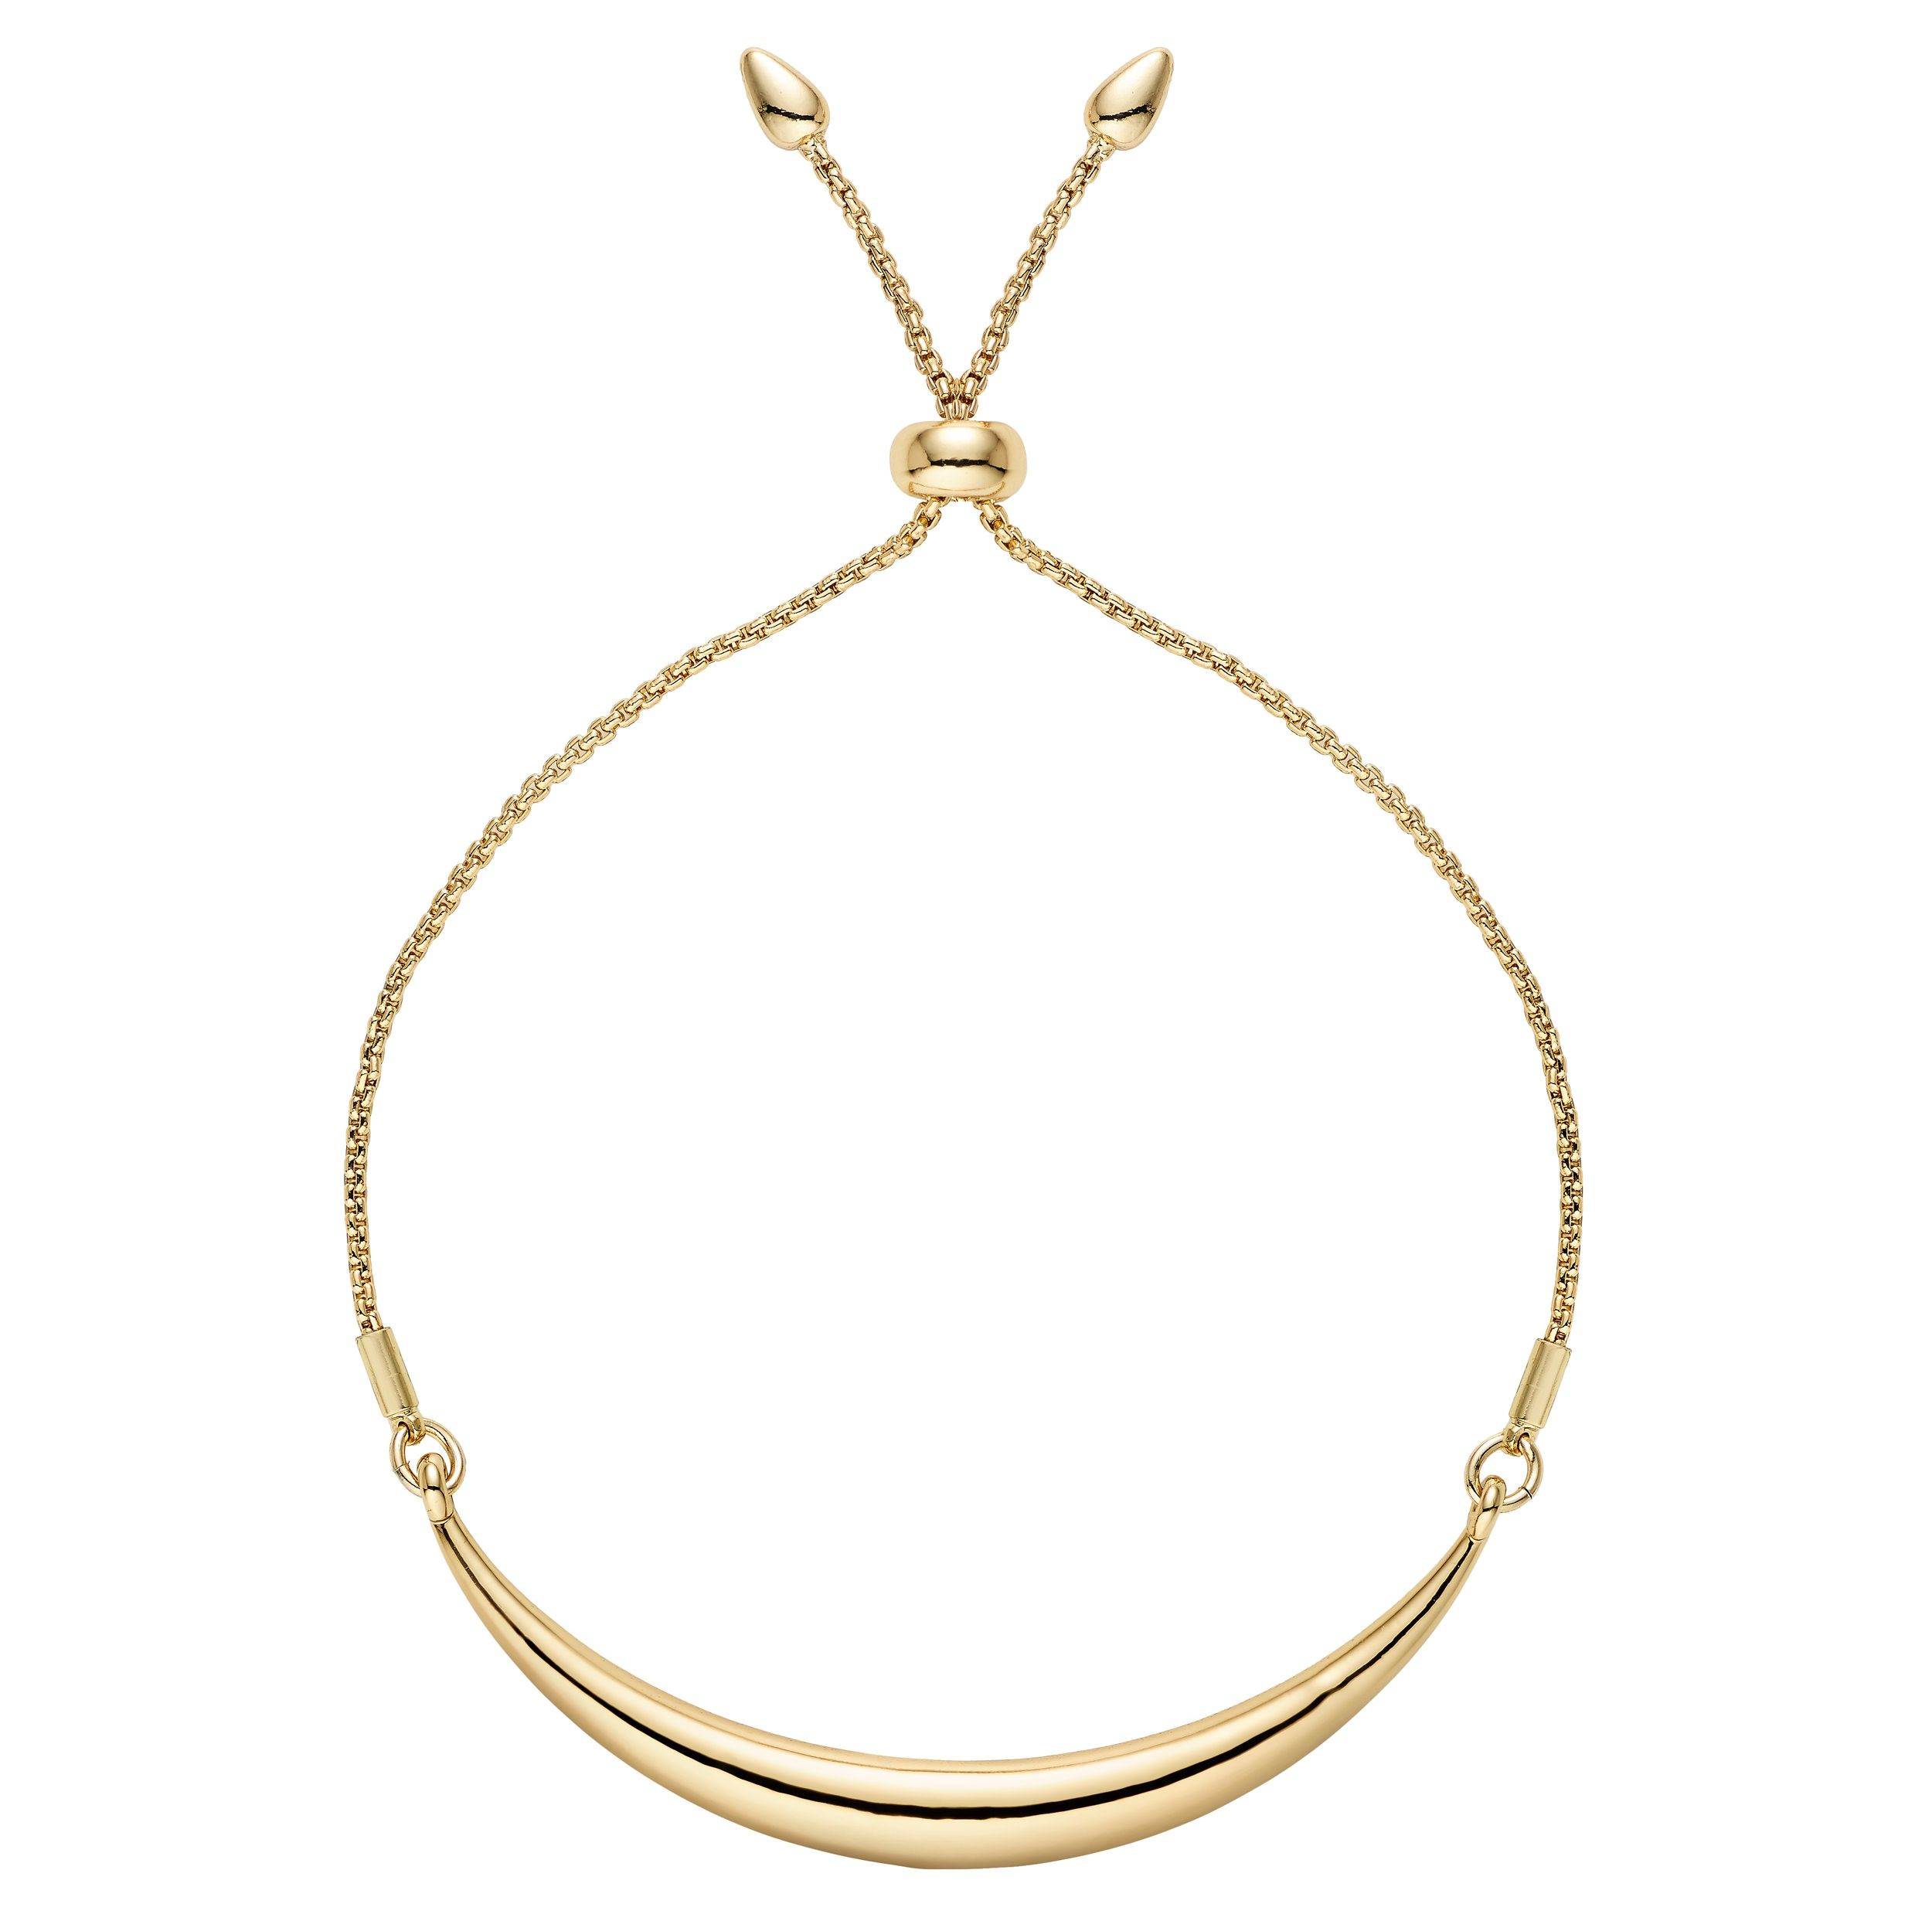 Buckley London Goluding Friendship Bracelet Gold